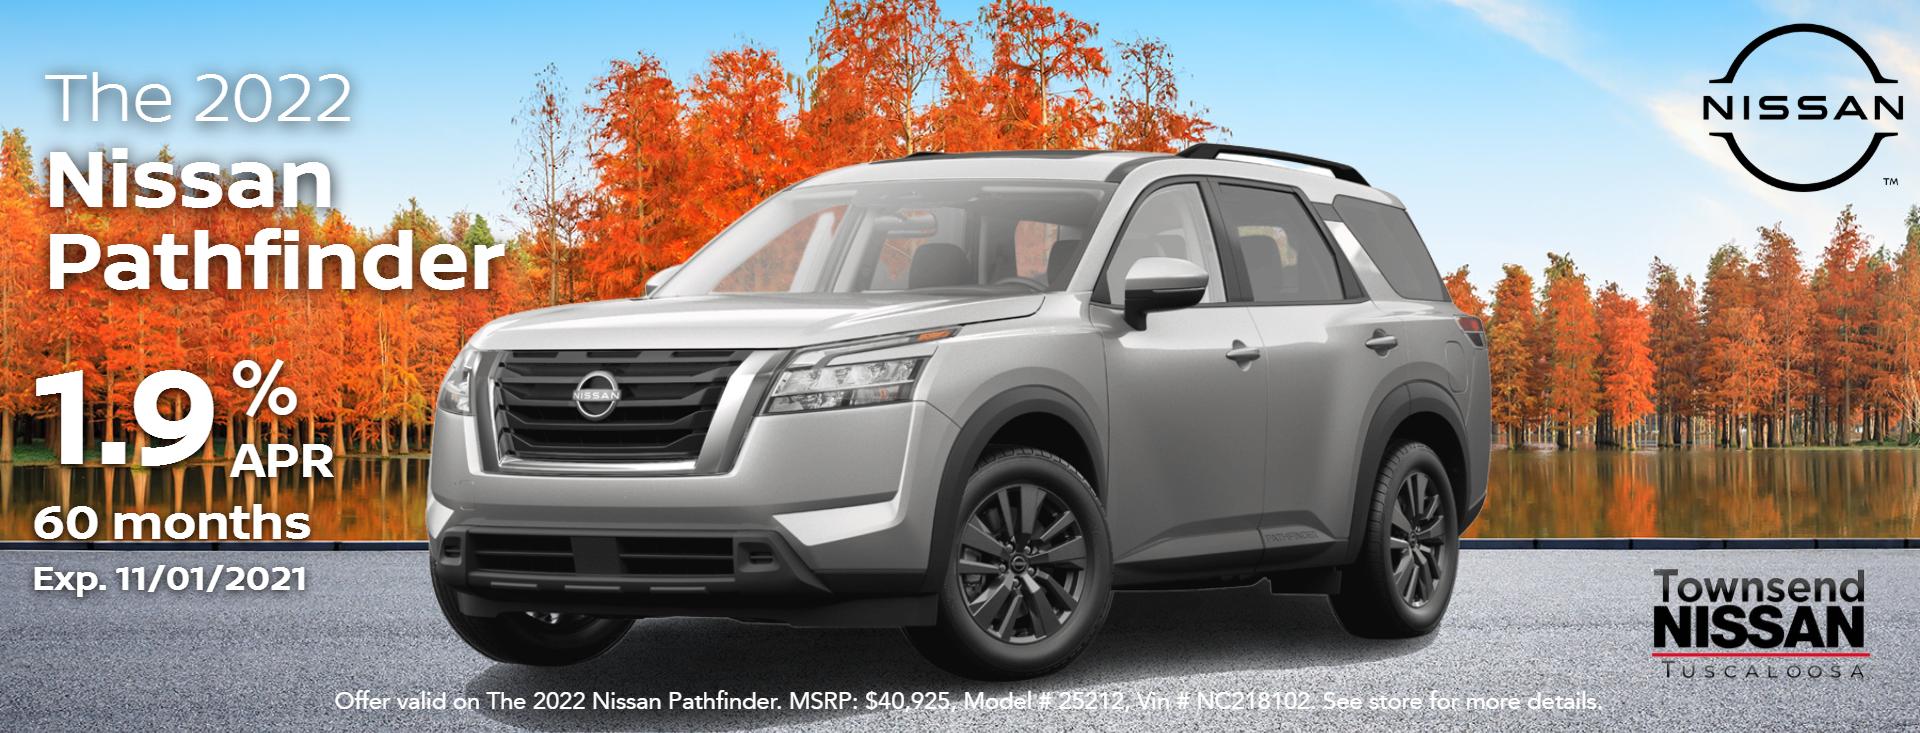 2022_Nissan_Pathfinder_SV 2WD_Thu Oct 07 2021 13_53_44 GMT-0500 (Central Daylight Time)